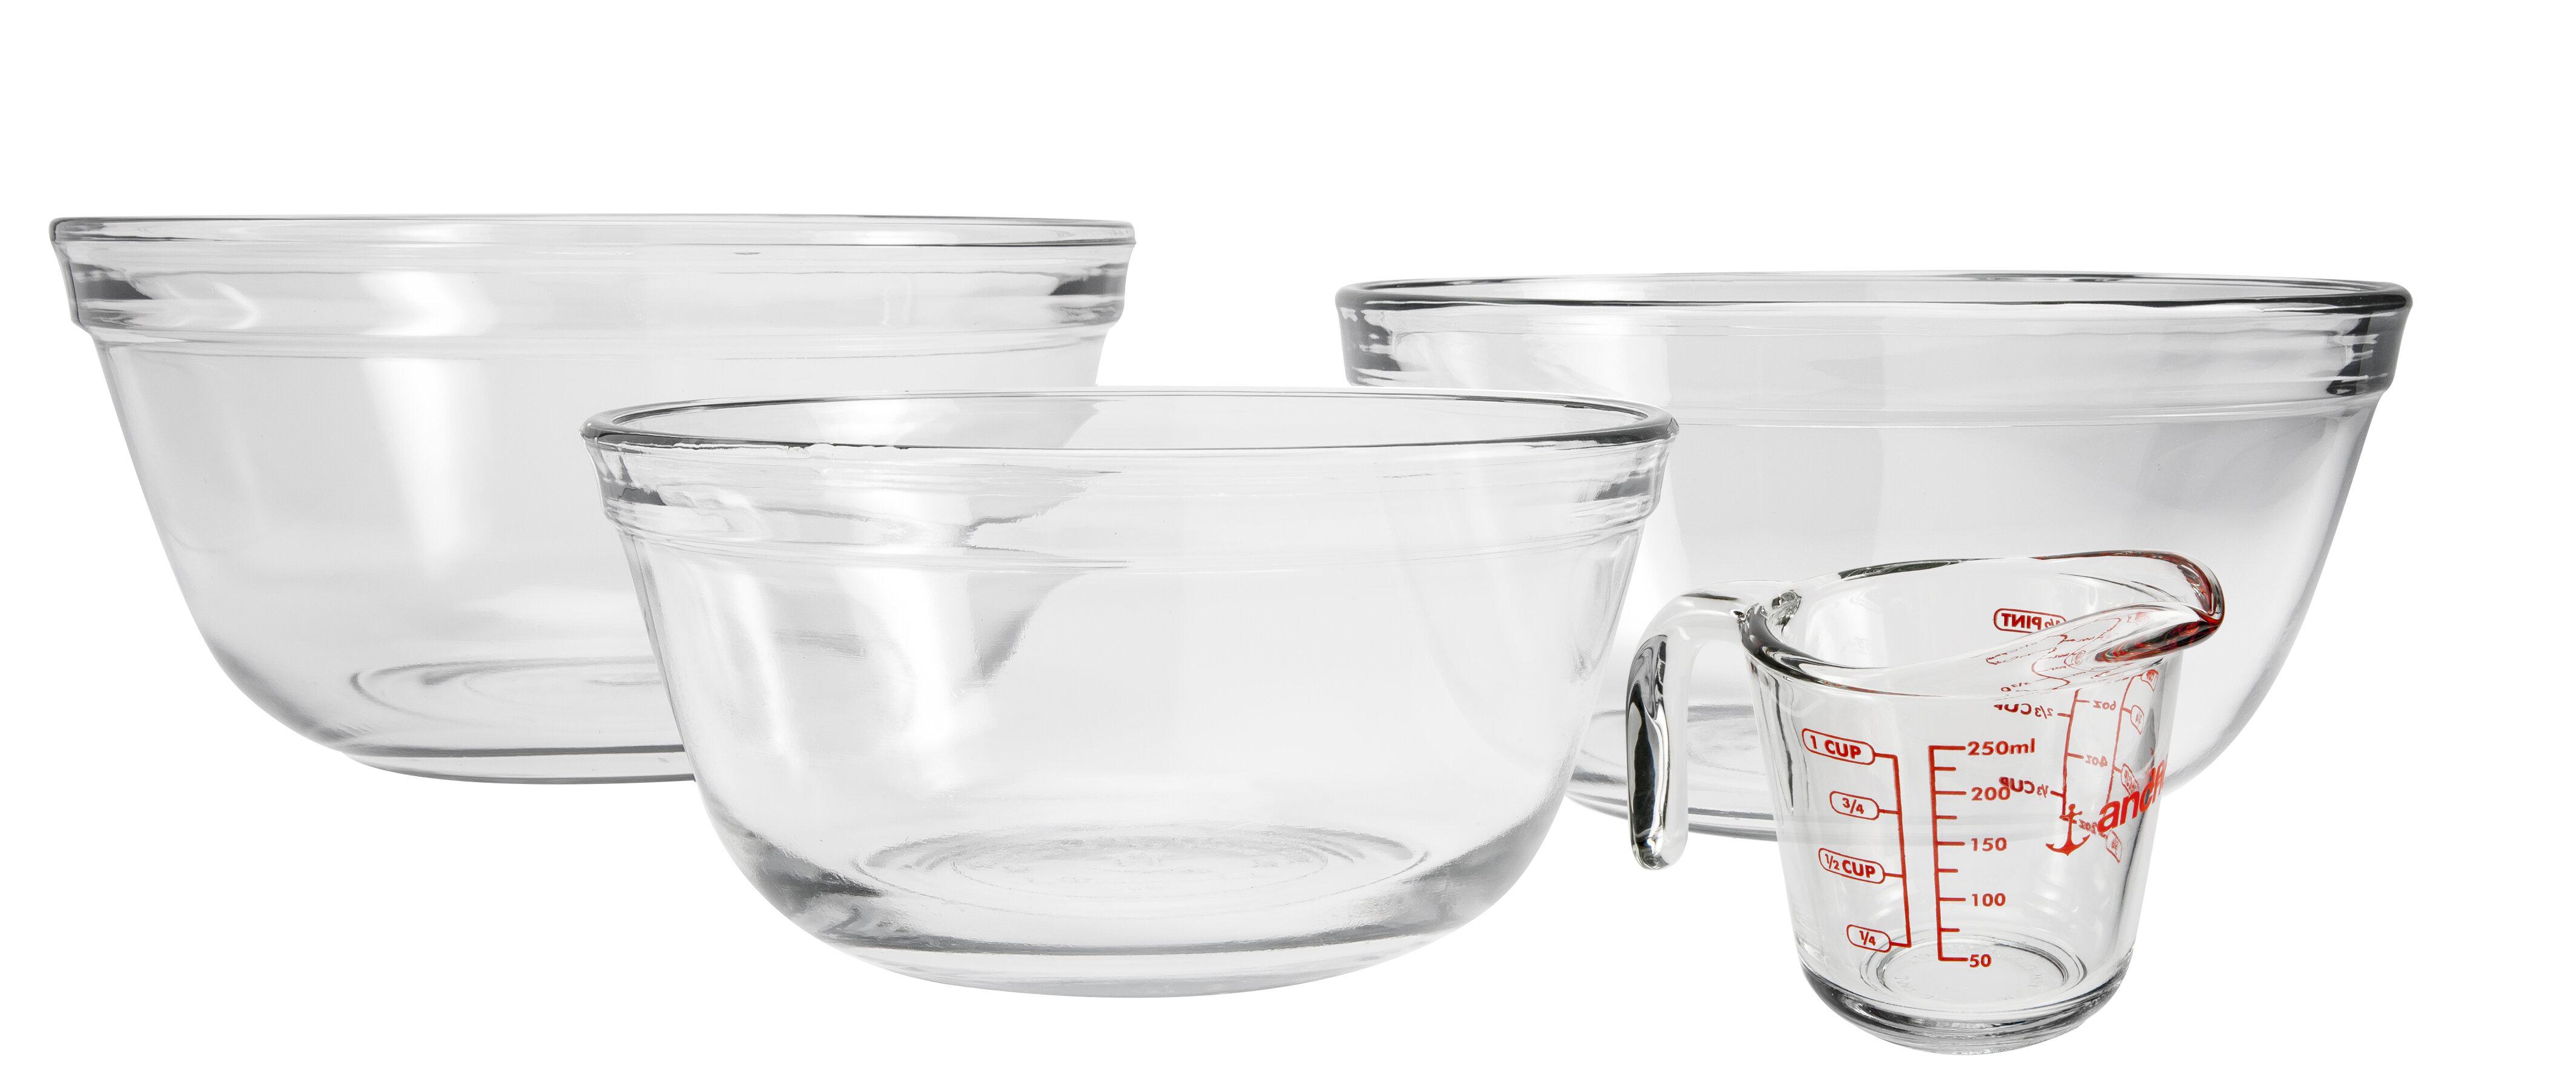 Anchor Hocking 2 Quart Ovenproof Glass Batter Bowl Set of 4